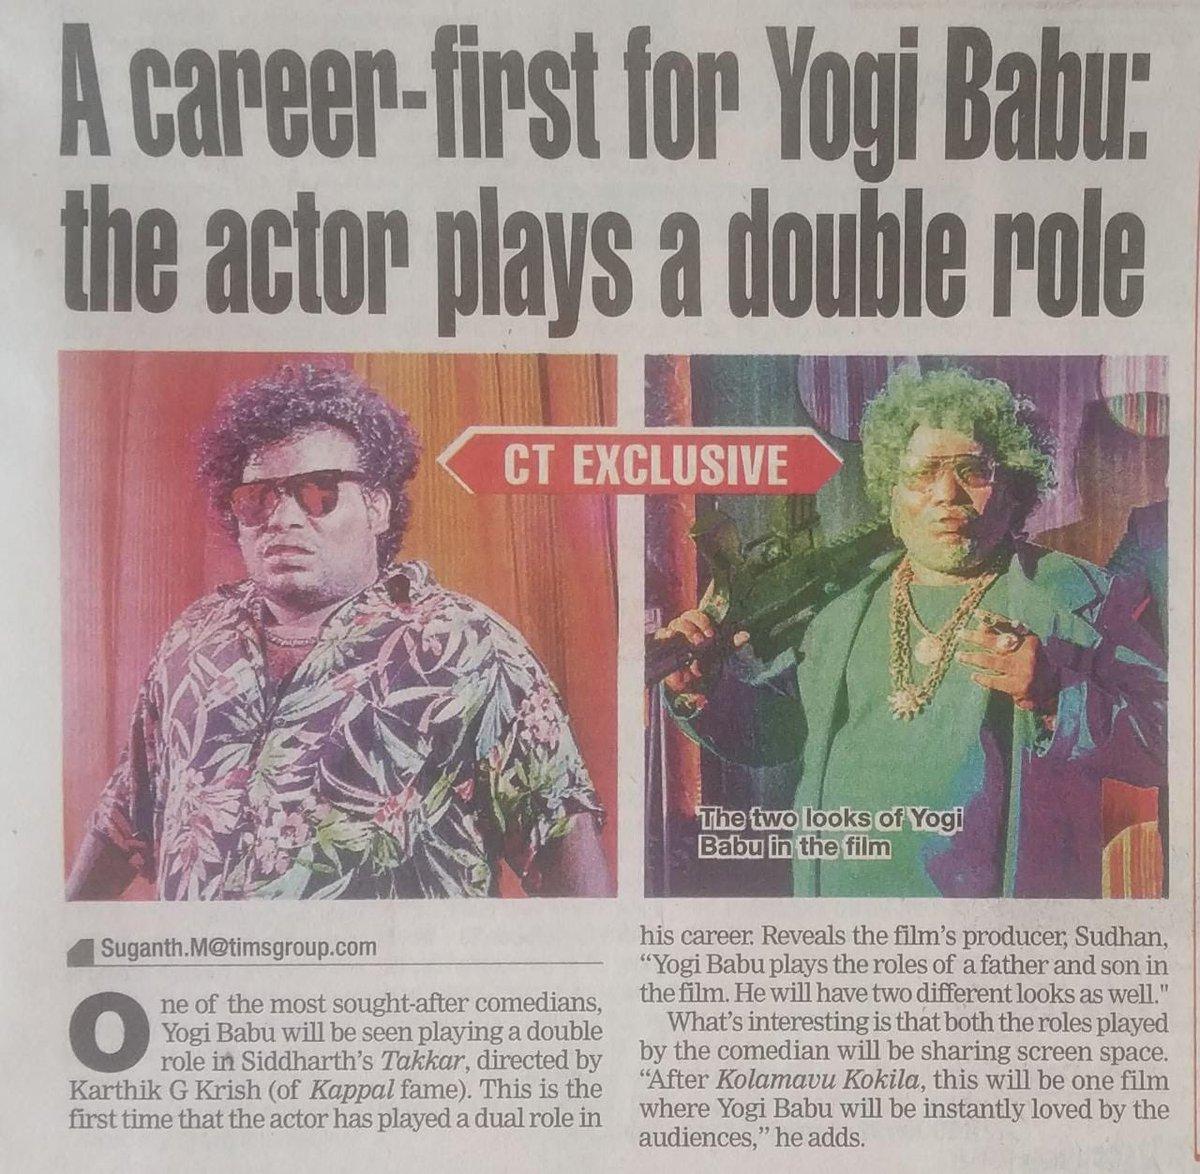 First Time Dual role in #Takkar ☺️  @Actor_Siddharth @Karthik_G_Krish @itsdivyanshak @nivaskprasanna @RjVigneshkanth @editorgowtham @PassionStudios_  @DoneChannel1 @thinkmusicindia @CtcMediaboy